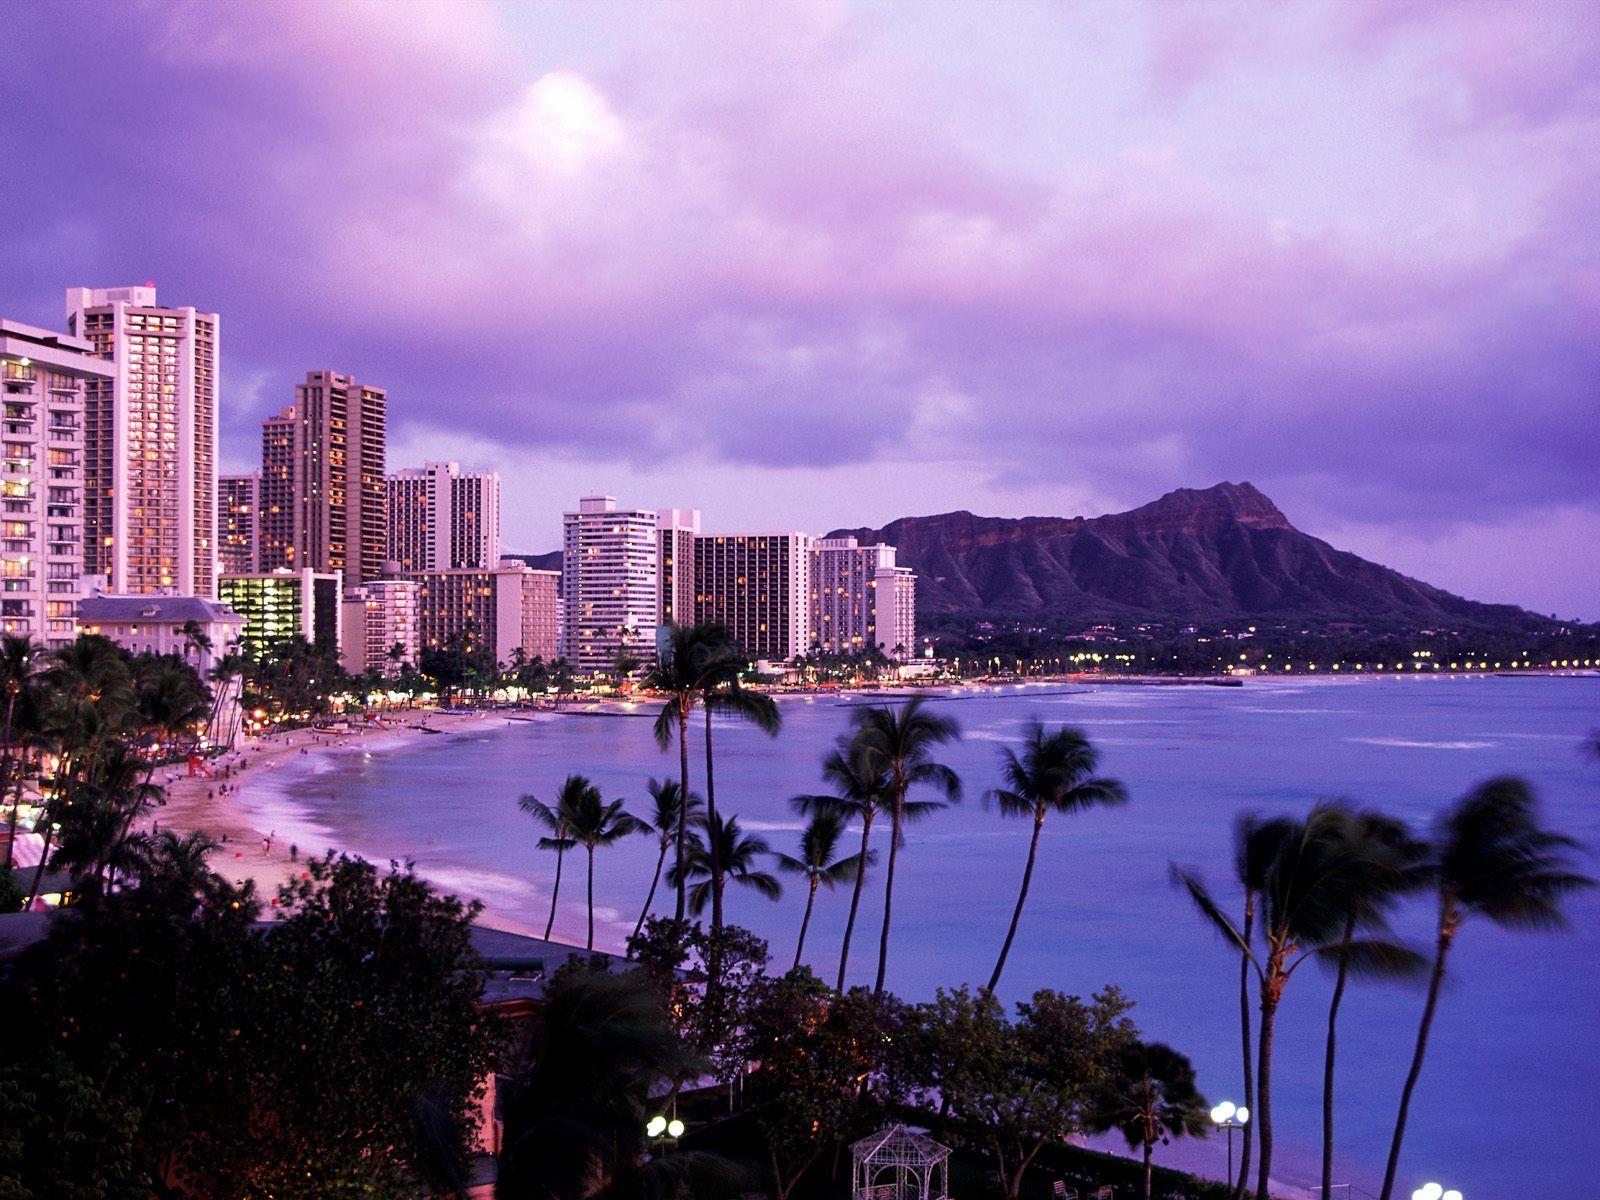 Known places Waikiki Beach Honolulu Oahu Hawaii desktop 1600x1200